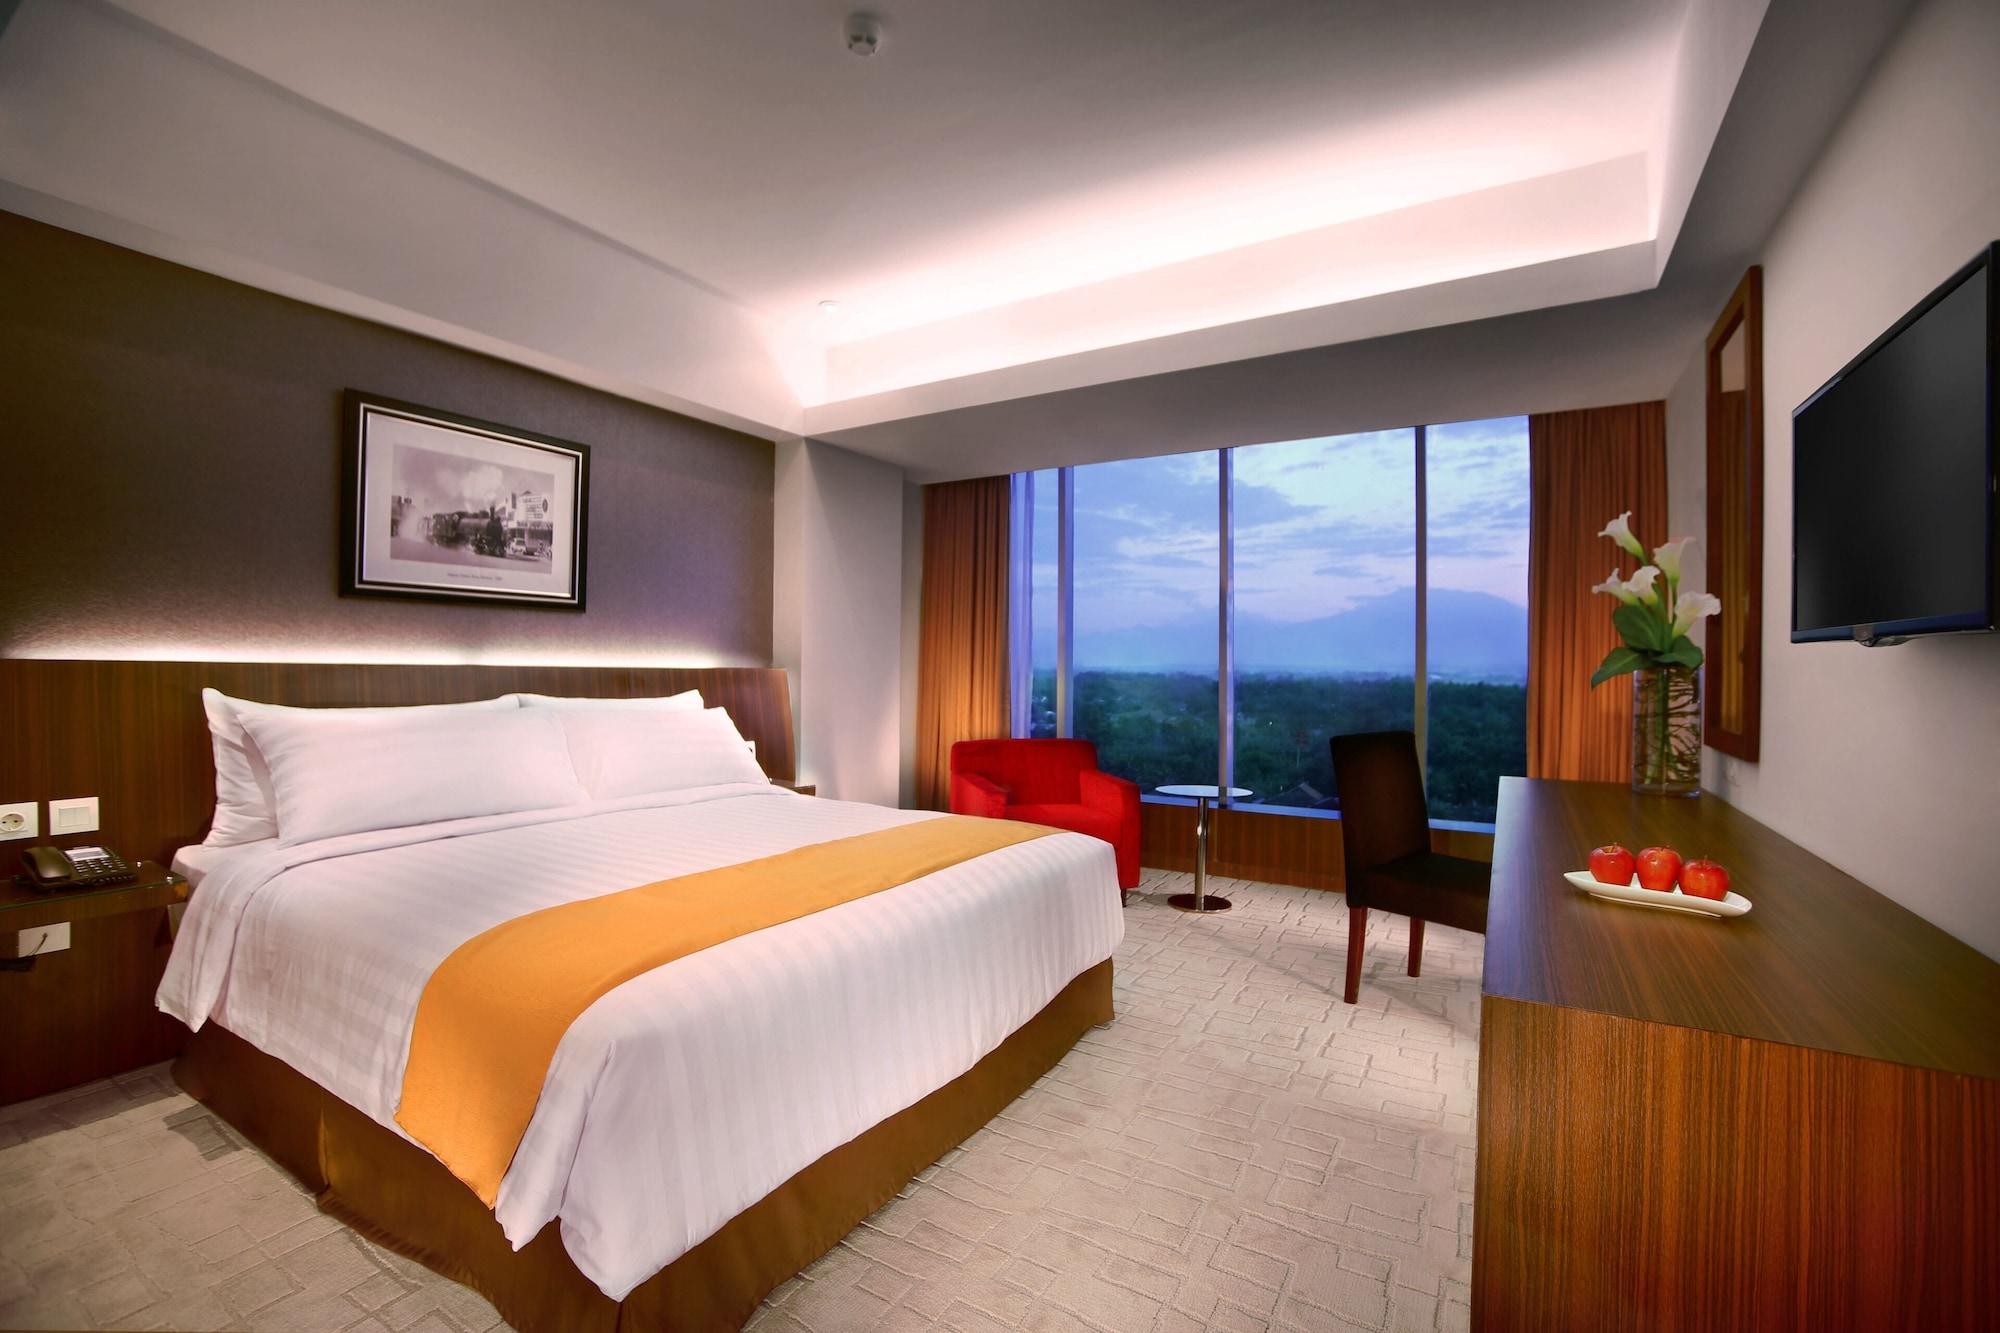 Aston Madiun Hotel & Conference Center, Madiun